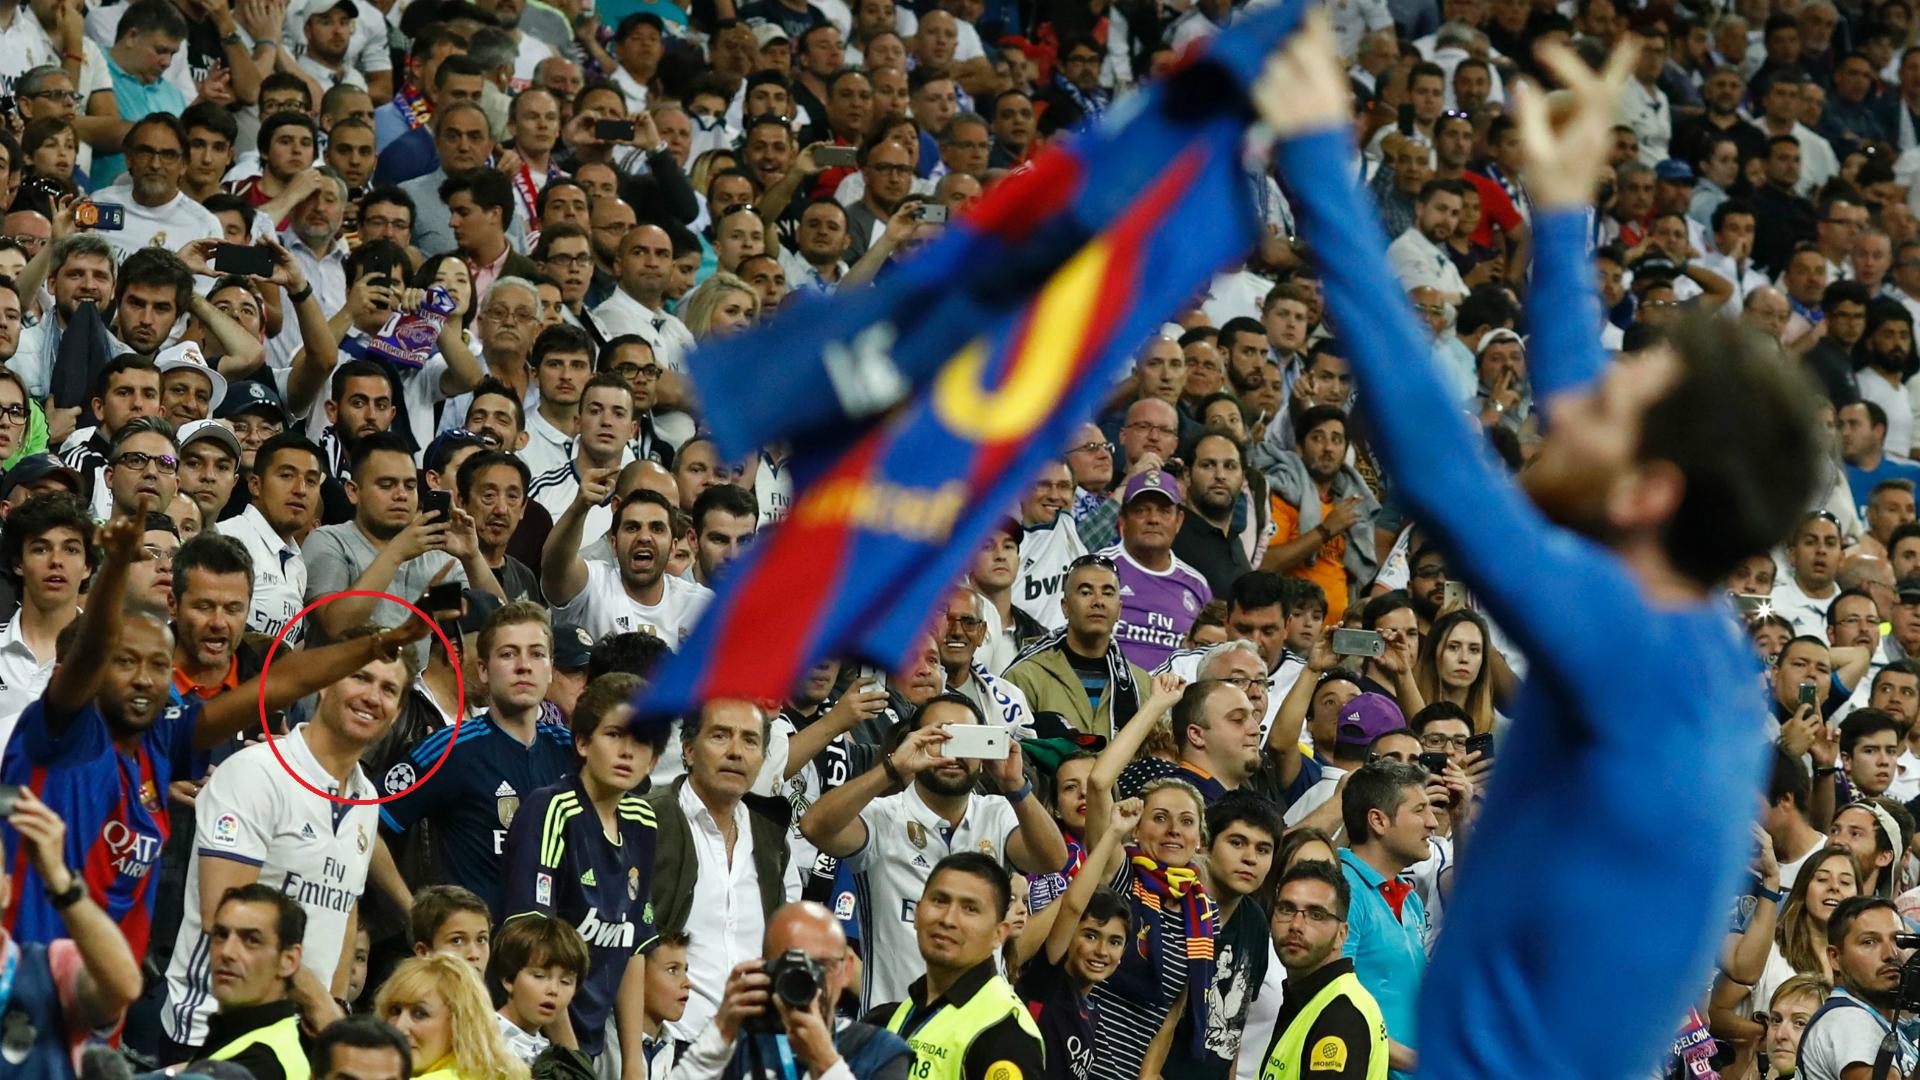 BODY ONLY Madrid fan risa gol Messi